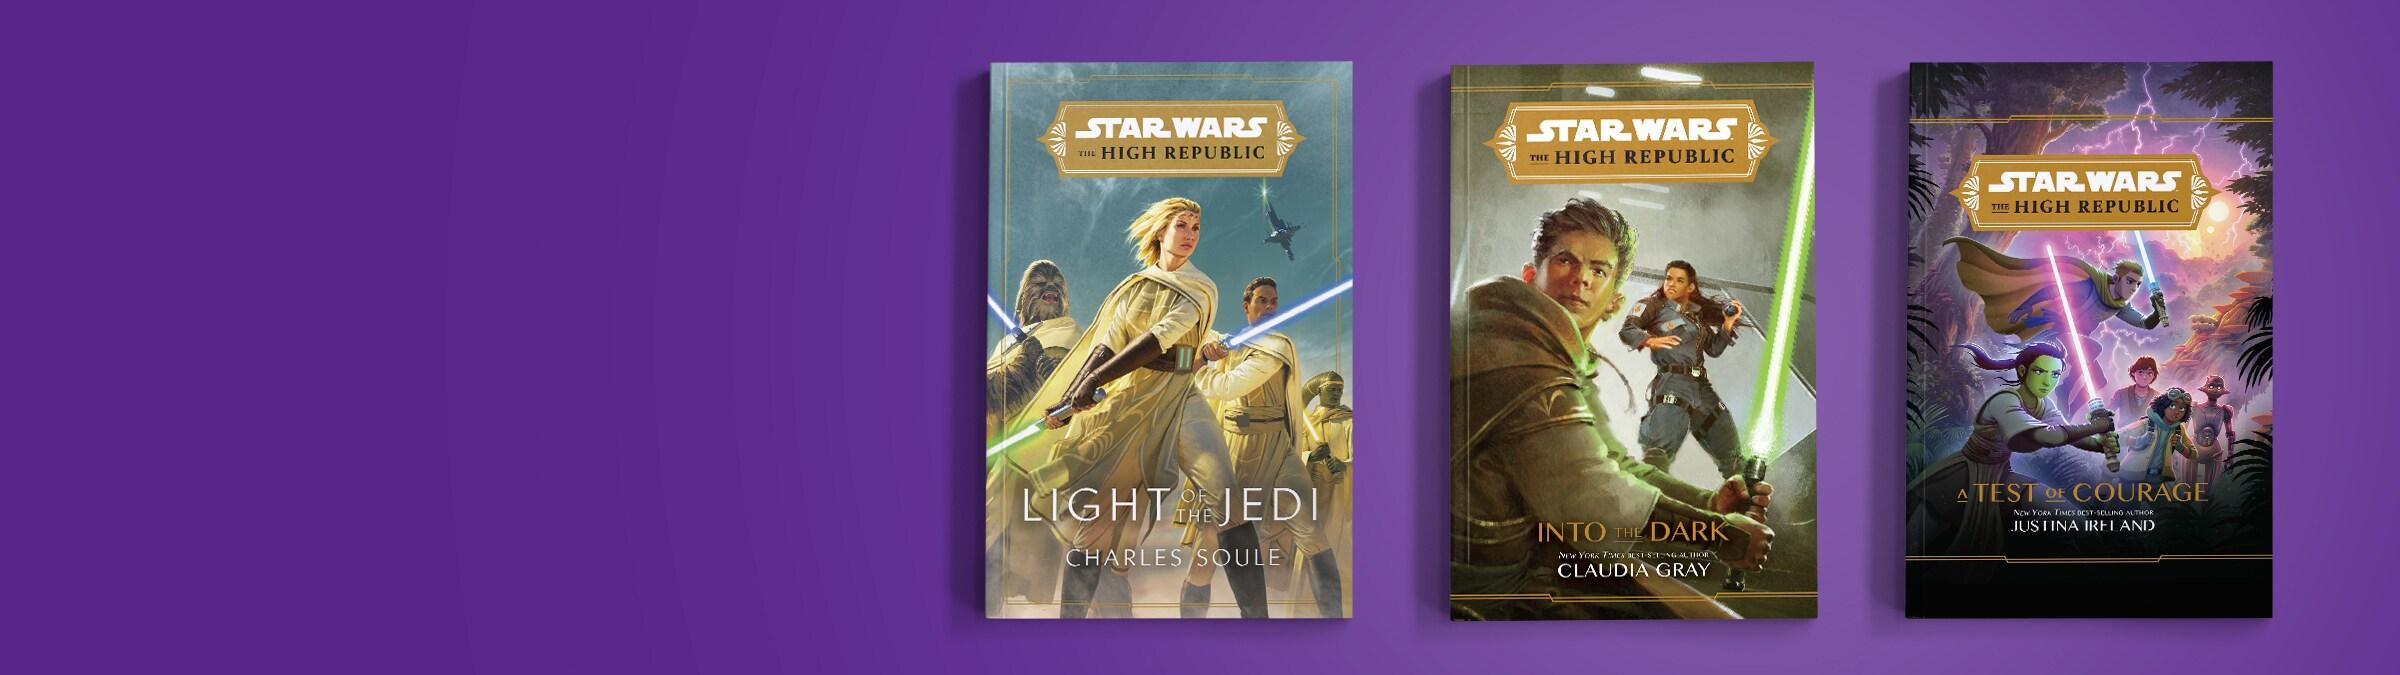 Shop - Star Wars - The High Republic - Books - Dymocks